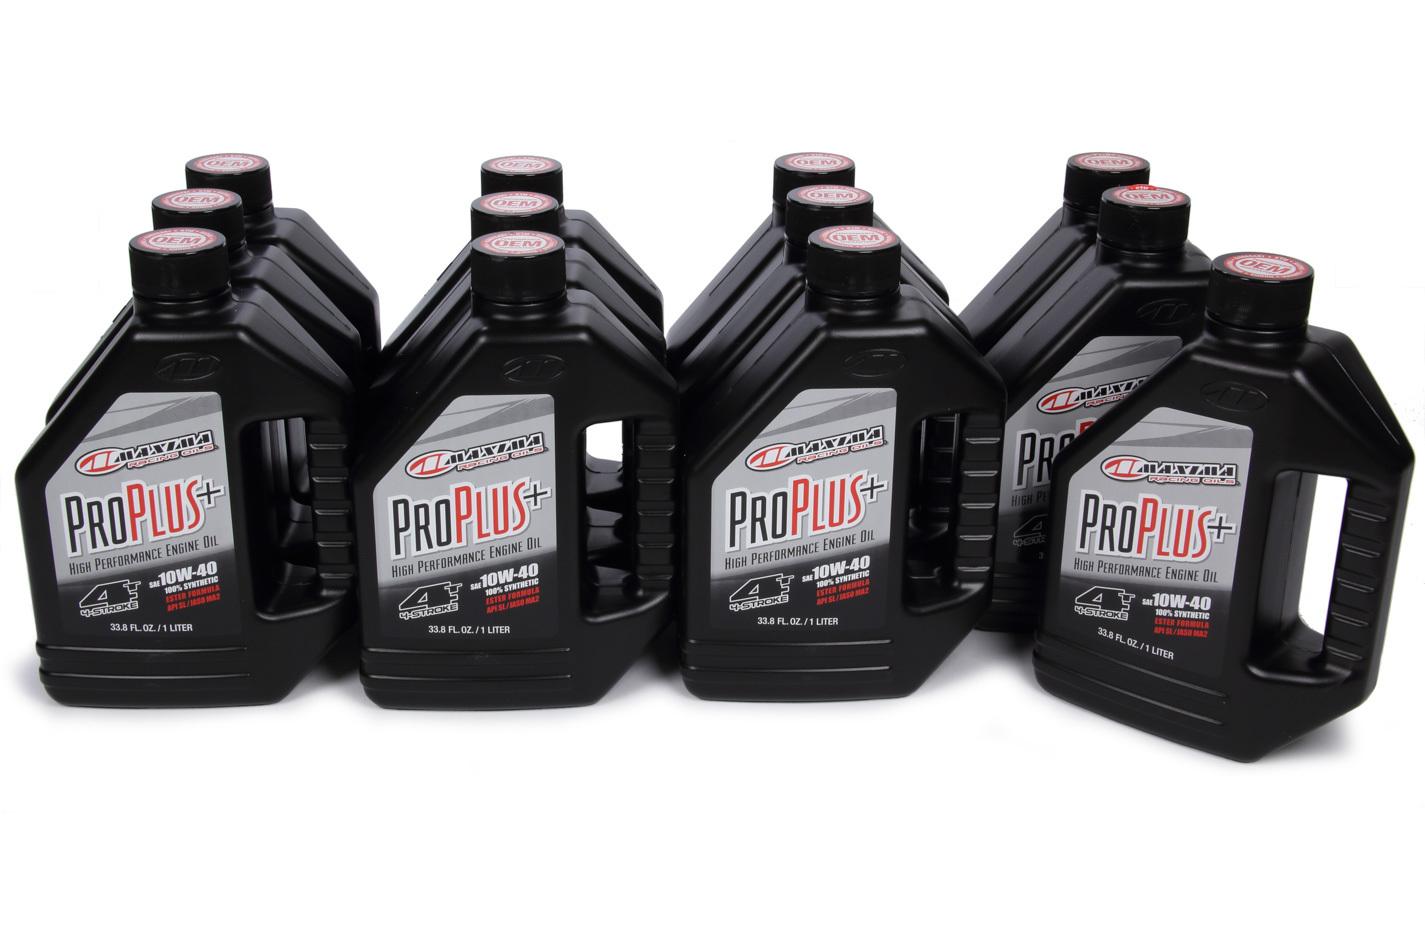 Pro Plus+ 10w40 Syntheti c Case 12 x 1 Liter